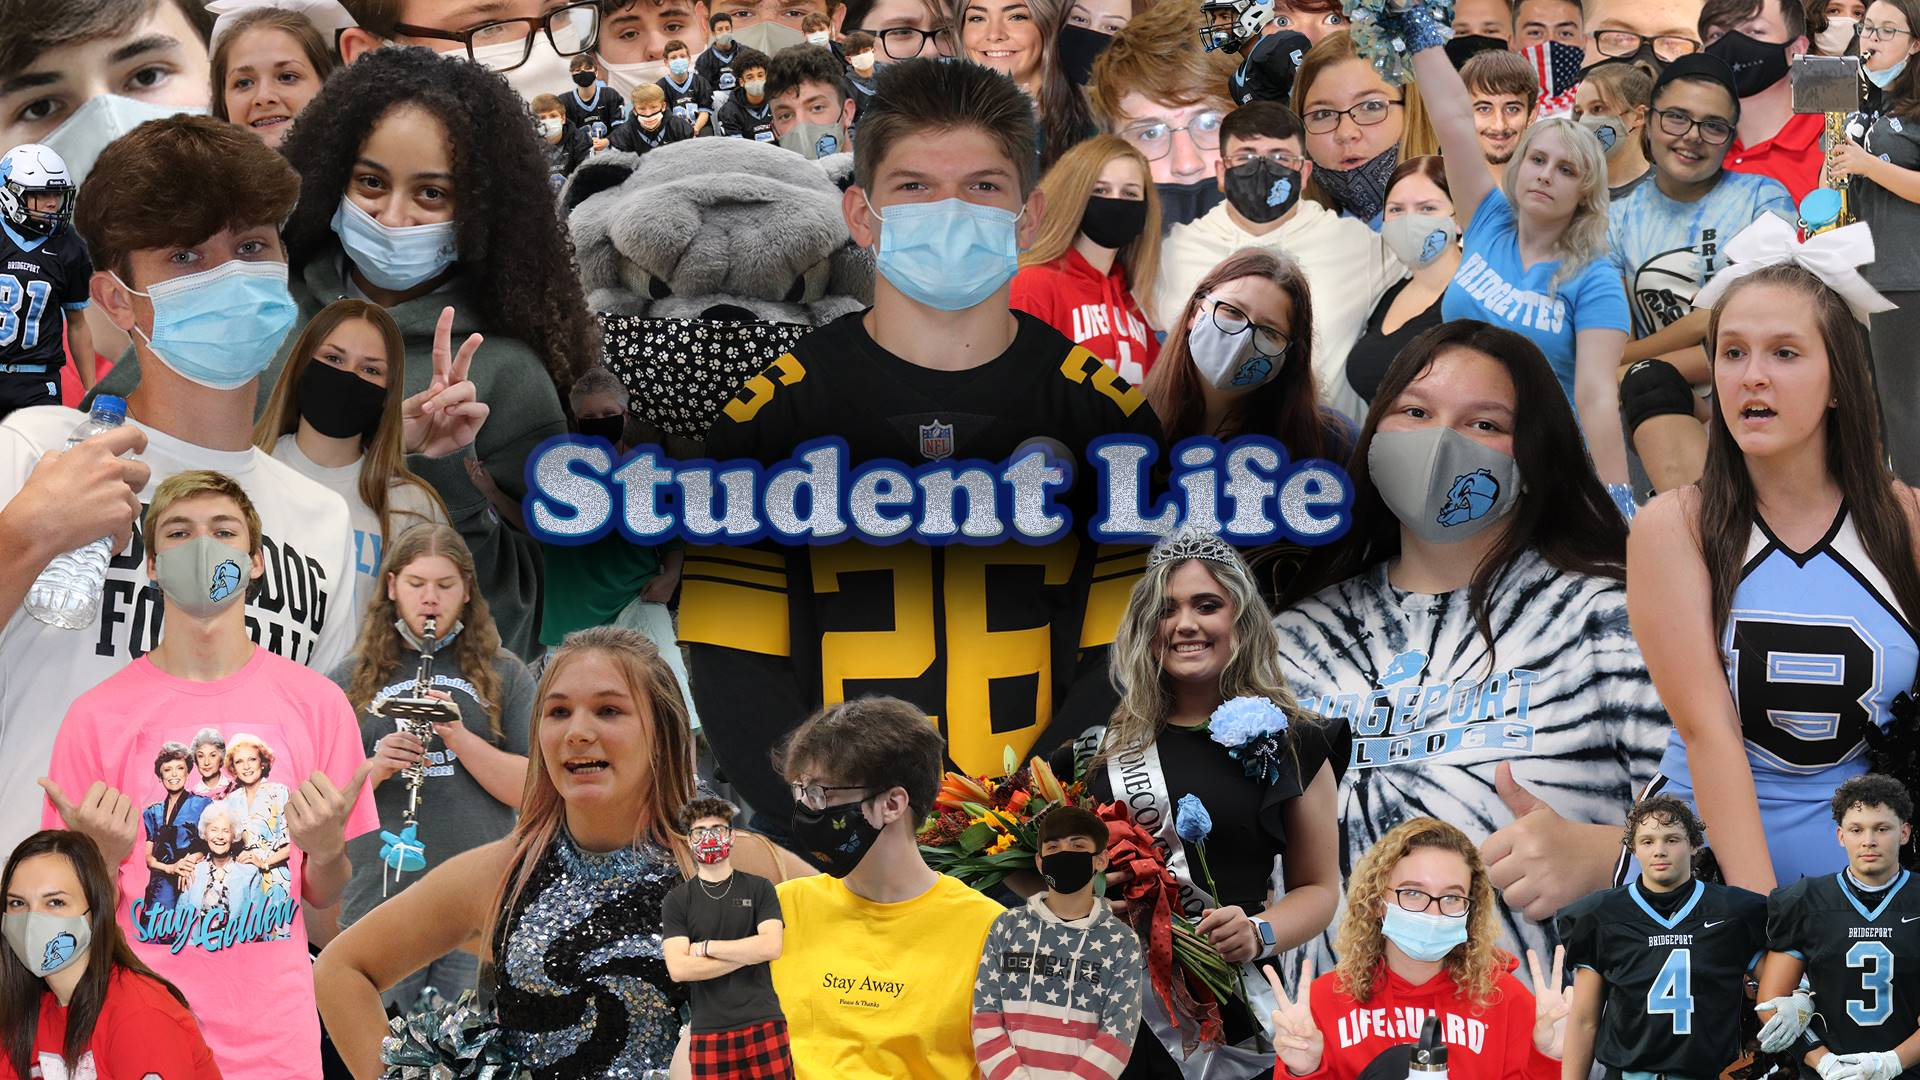 1 Emma Student Life Image